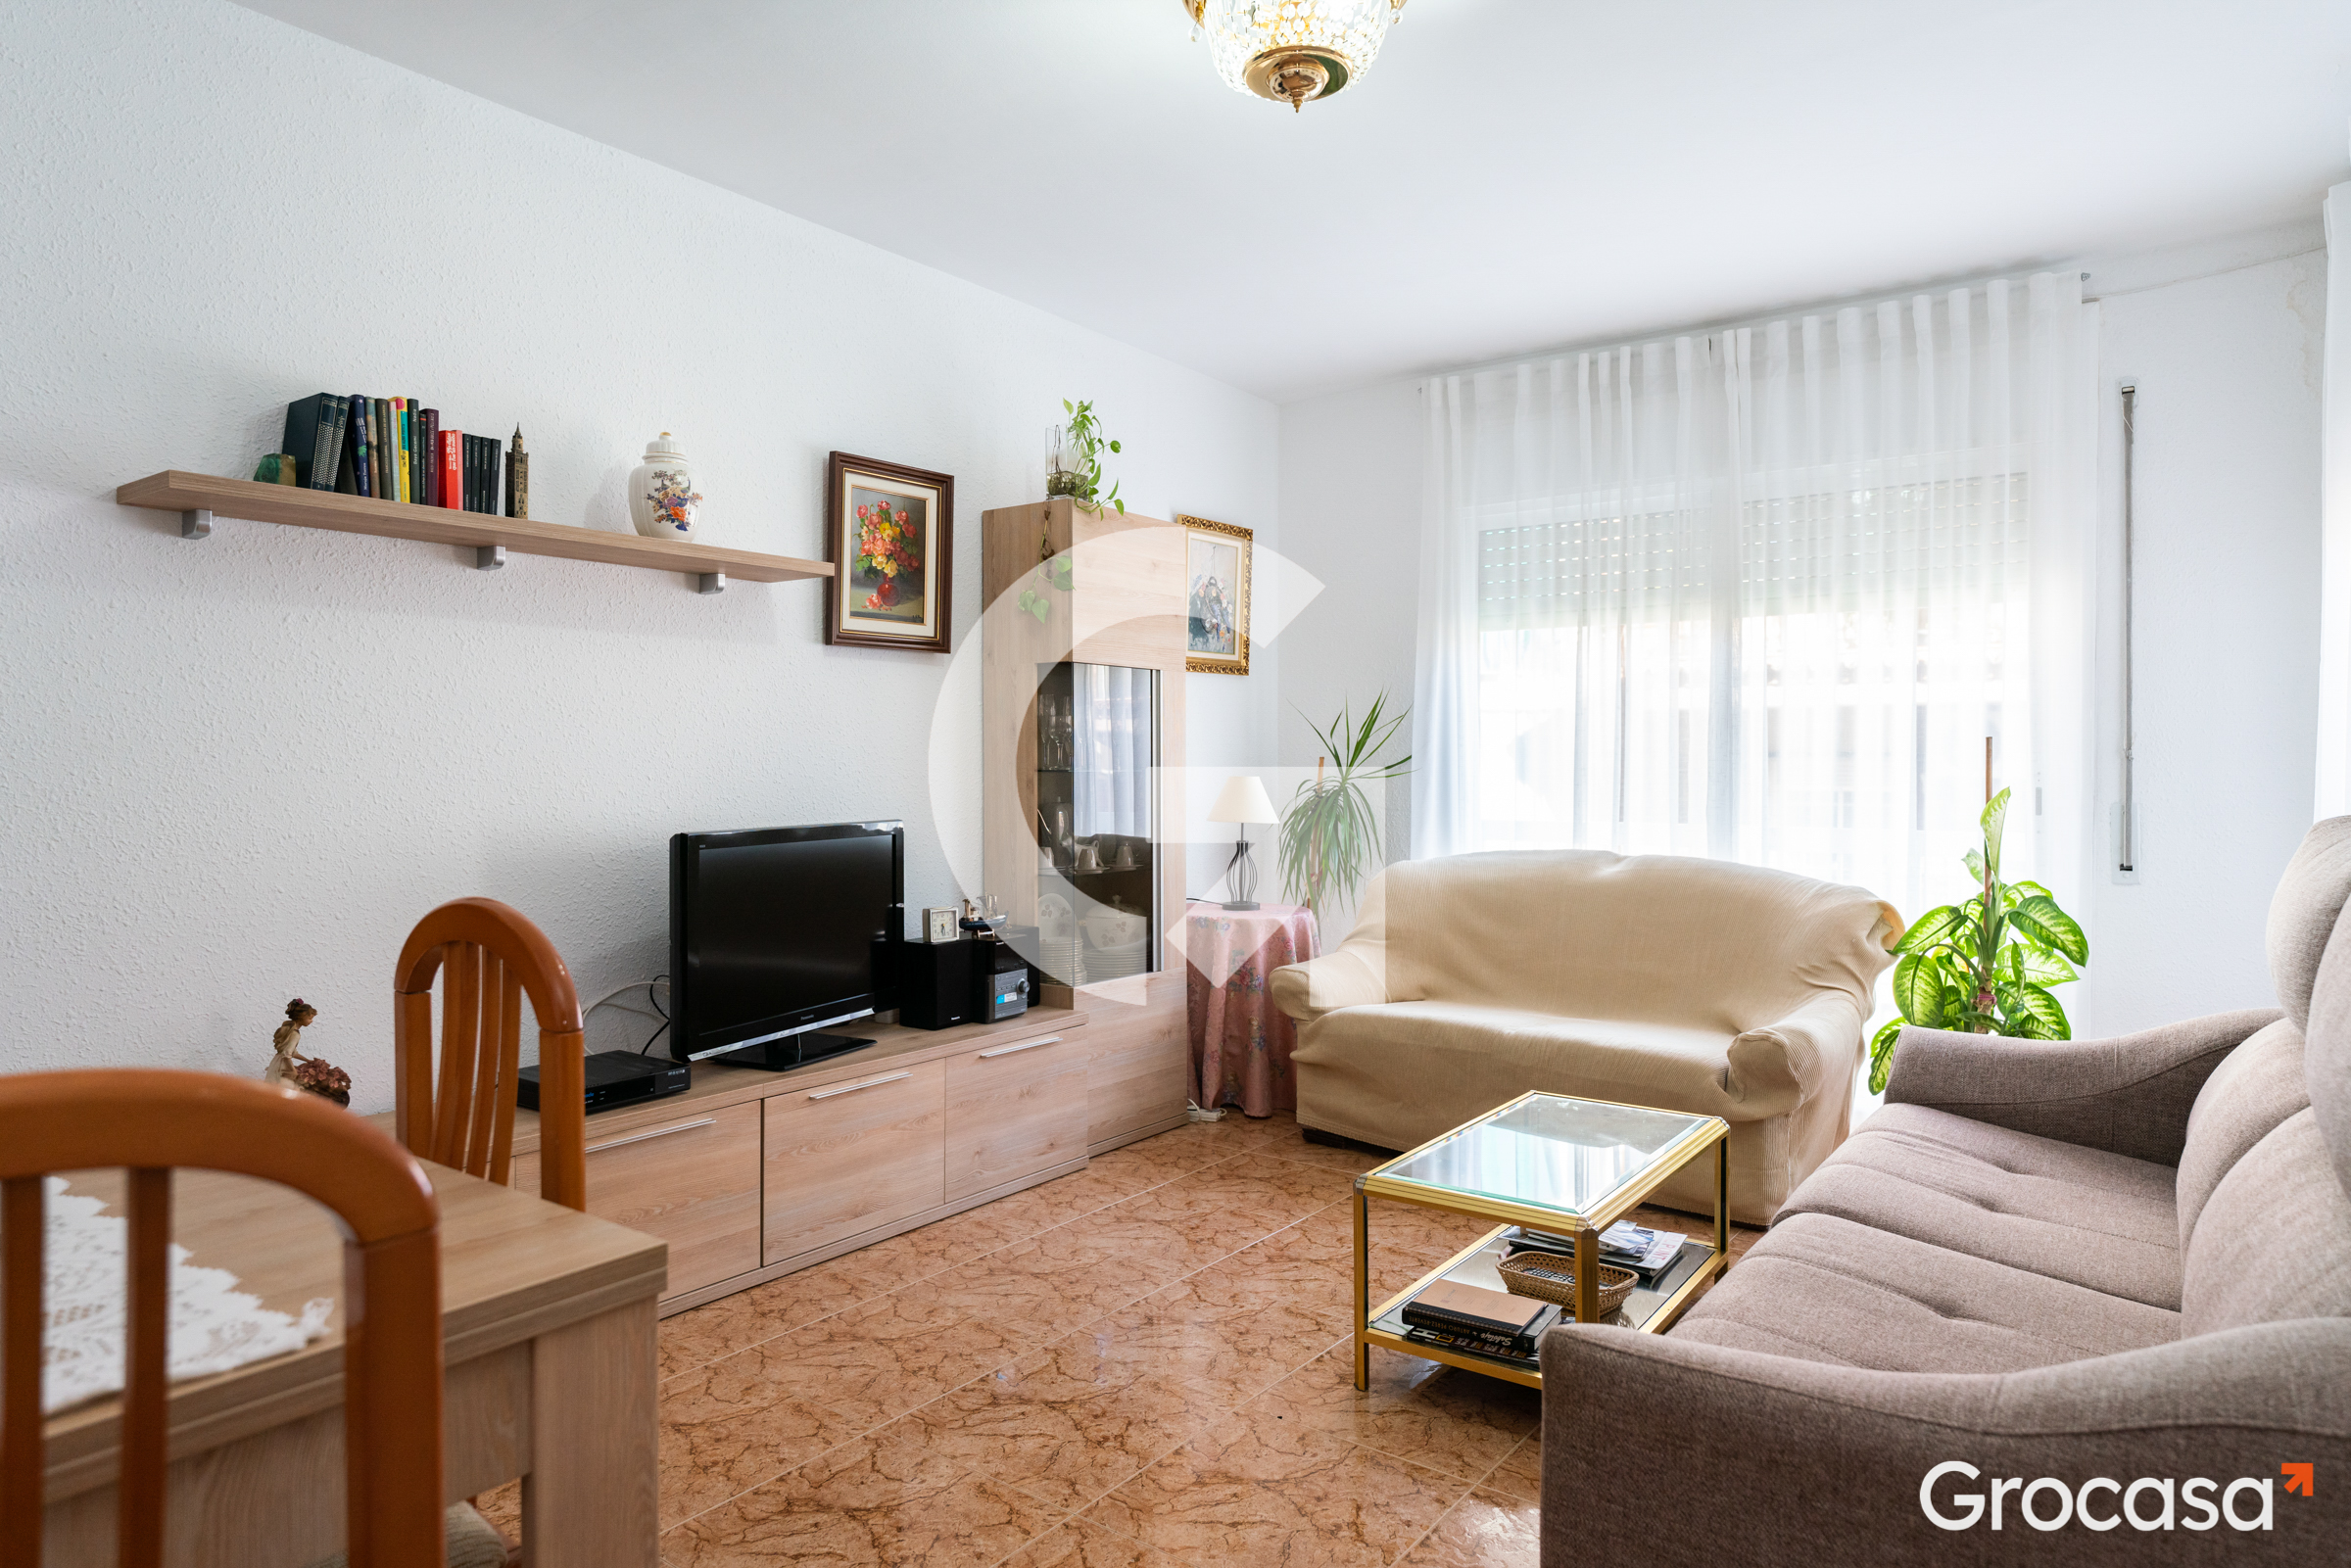 Piso en Can vidalet en Esplugues de Llobregat en Venta por 255.000€